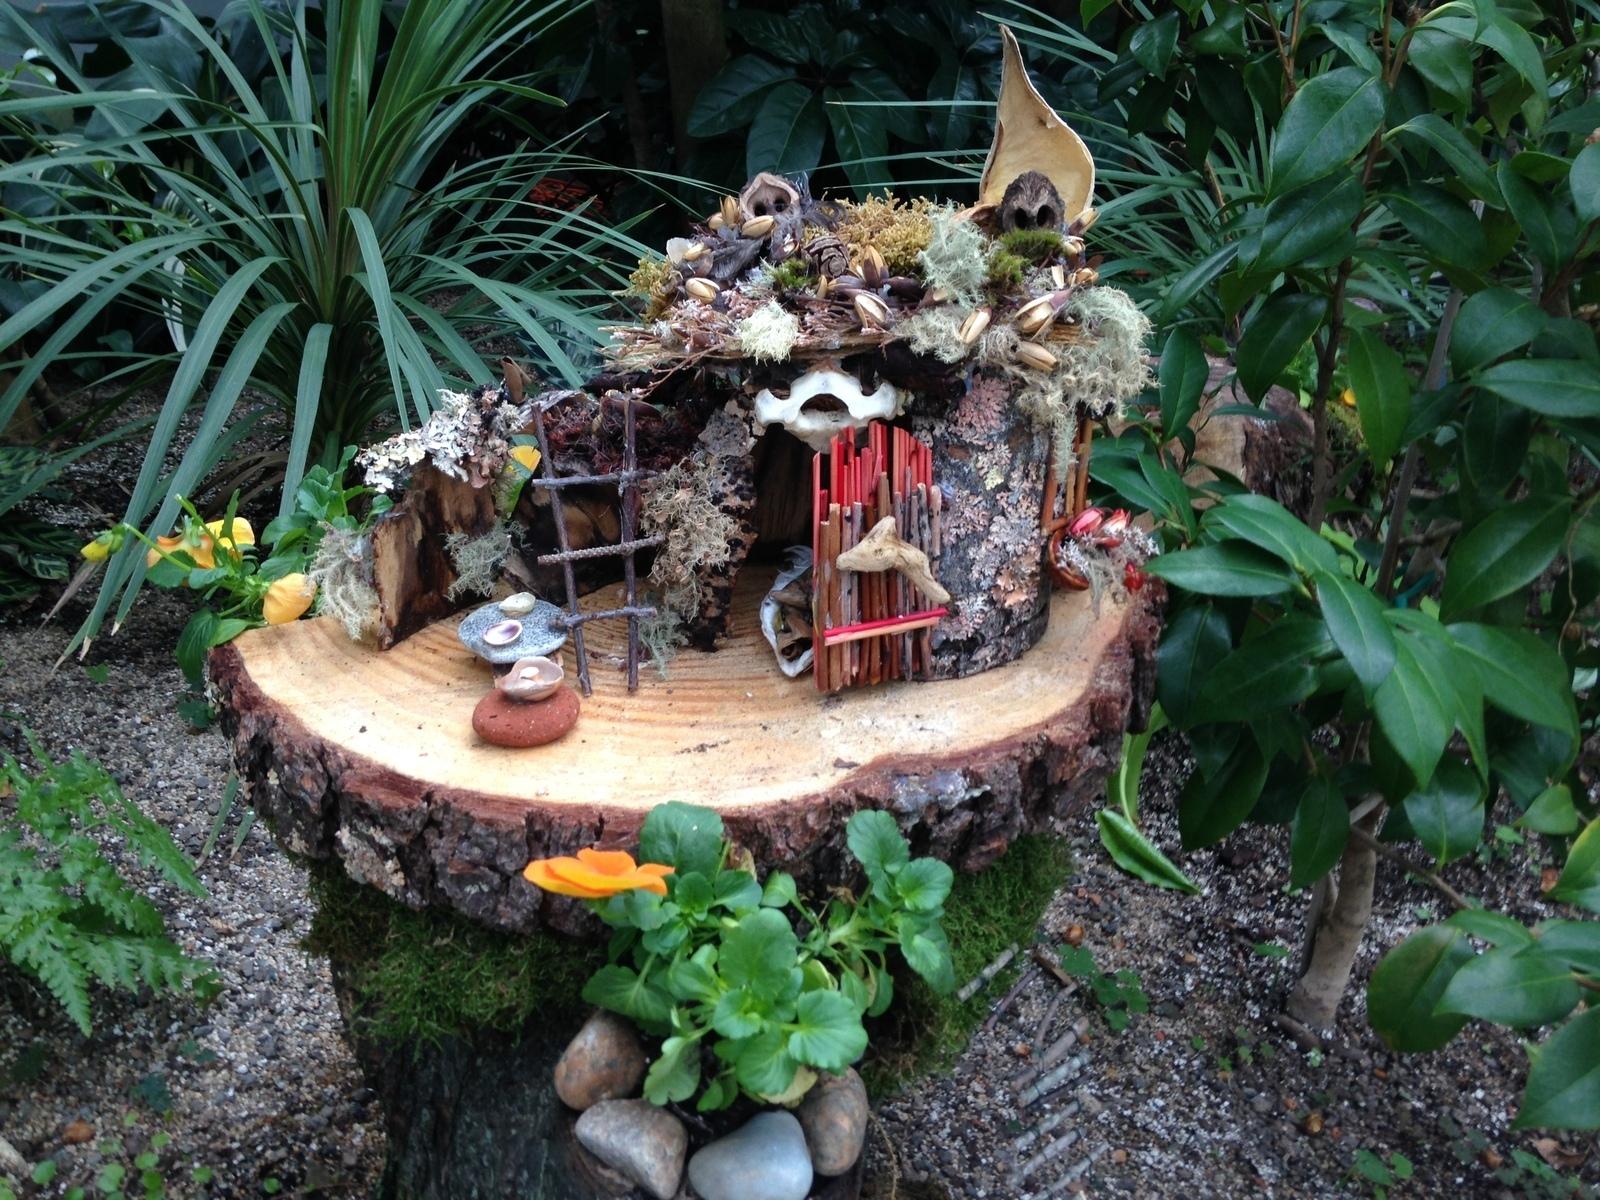 Gnome In Garden: Fairy Garden Days At Roger Williams Park Botanical Center